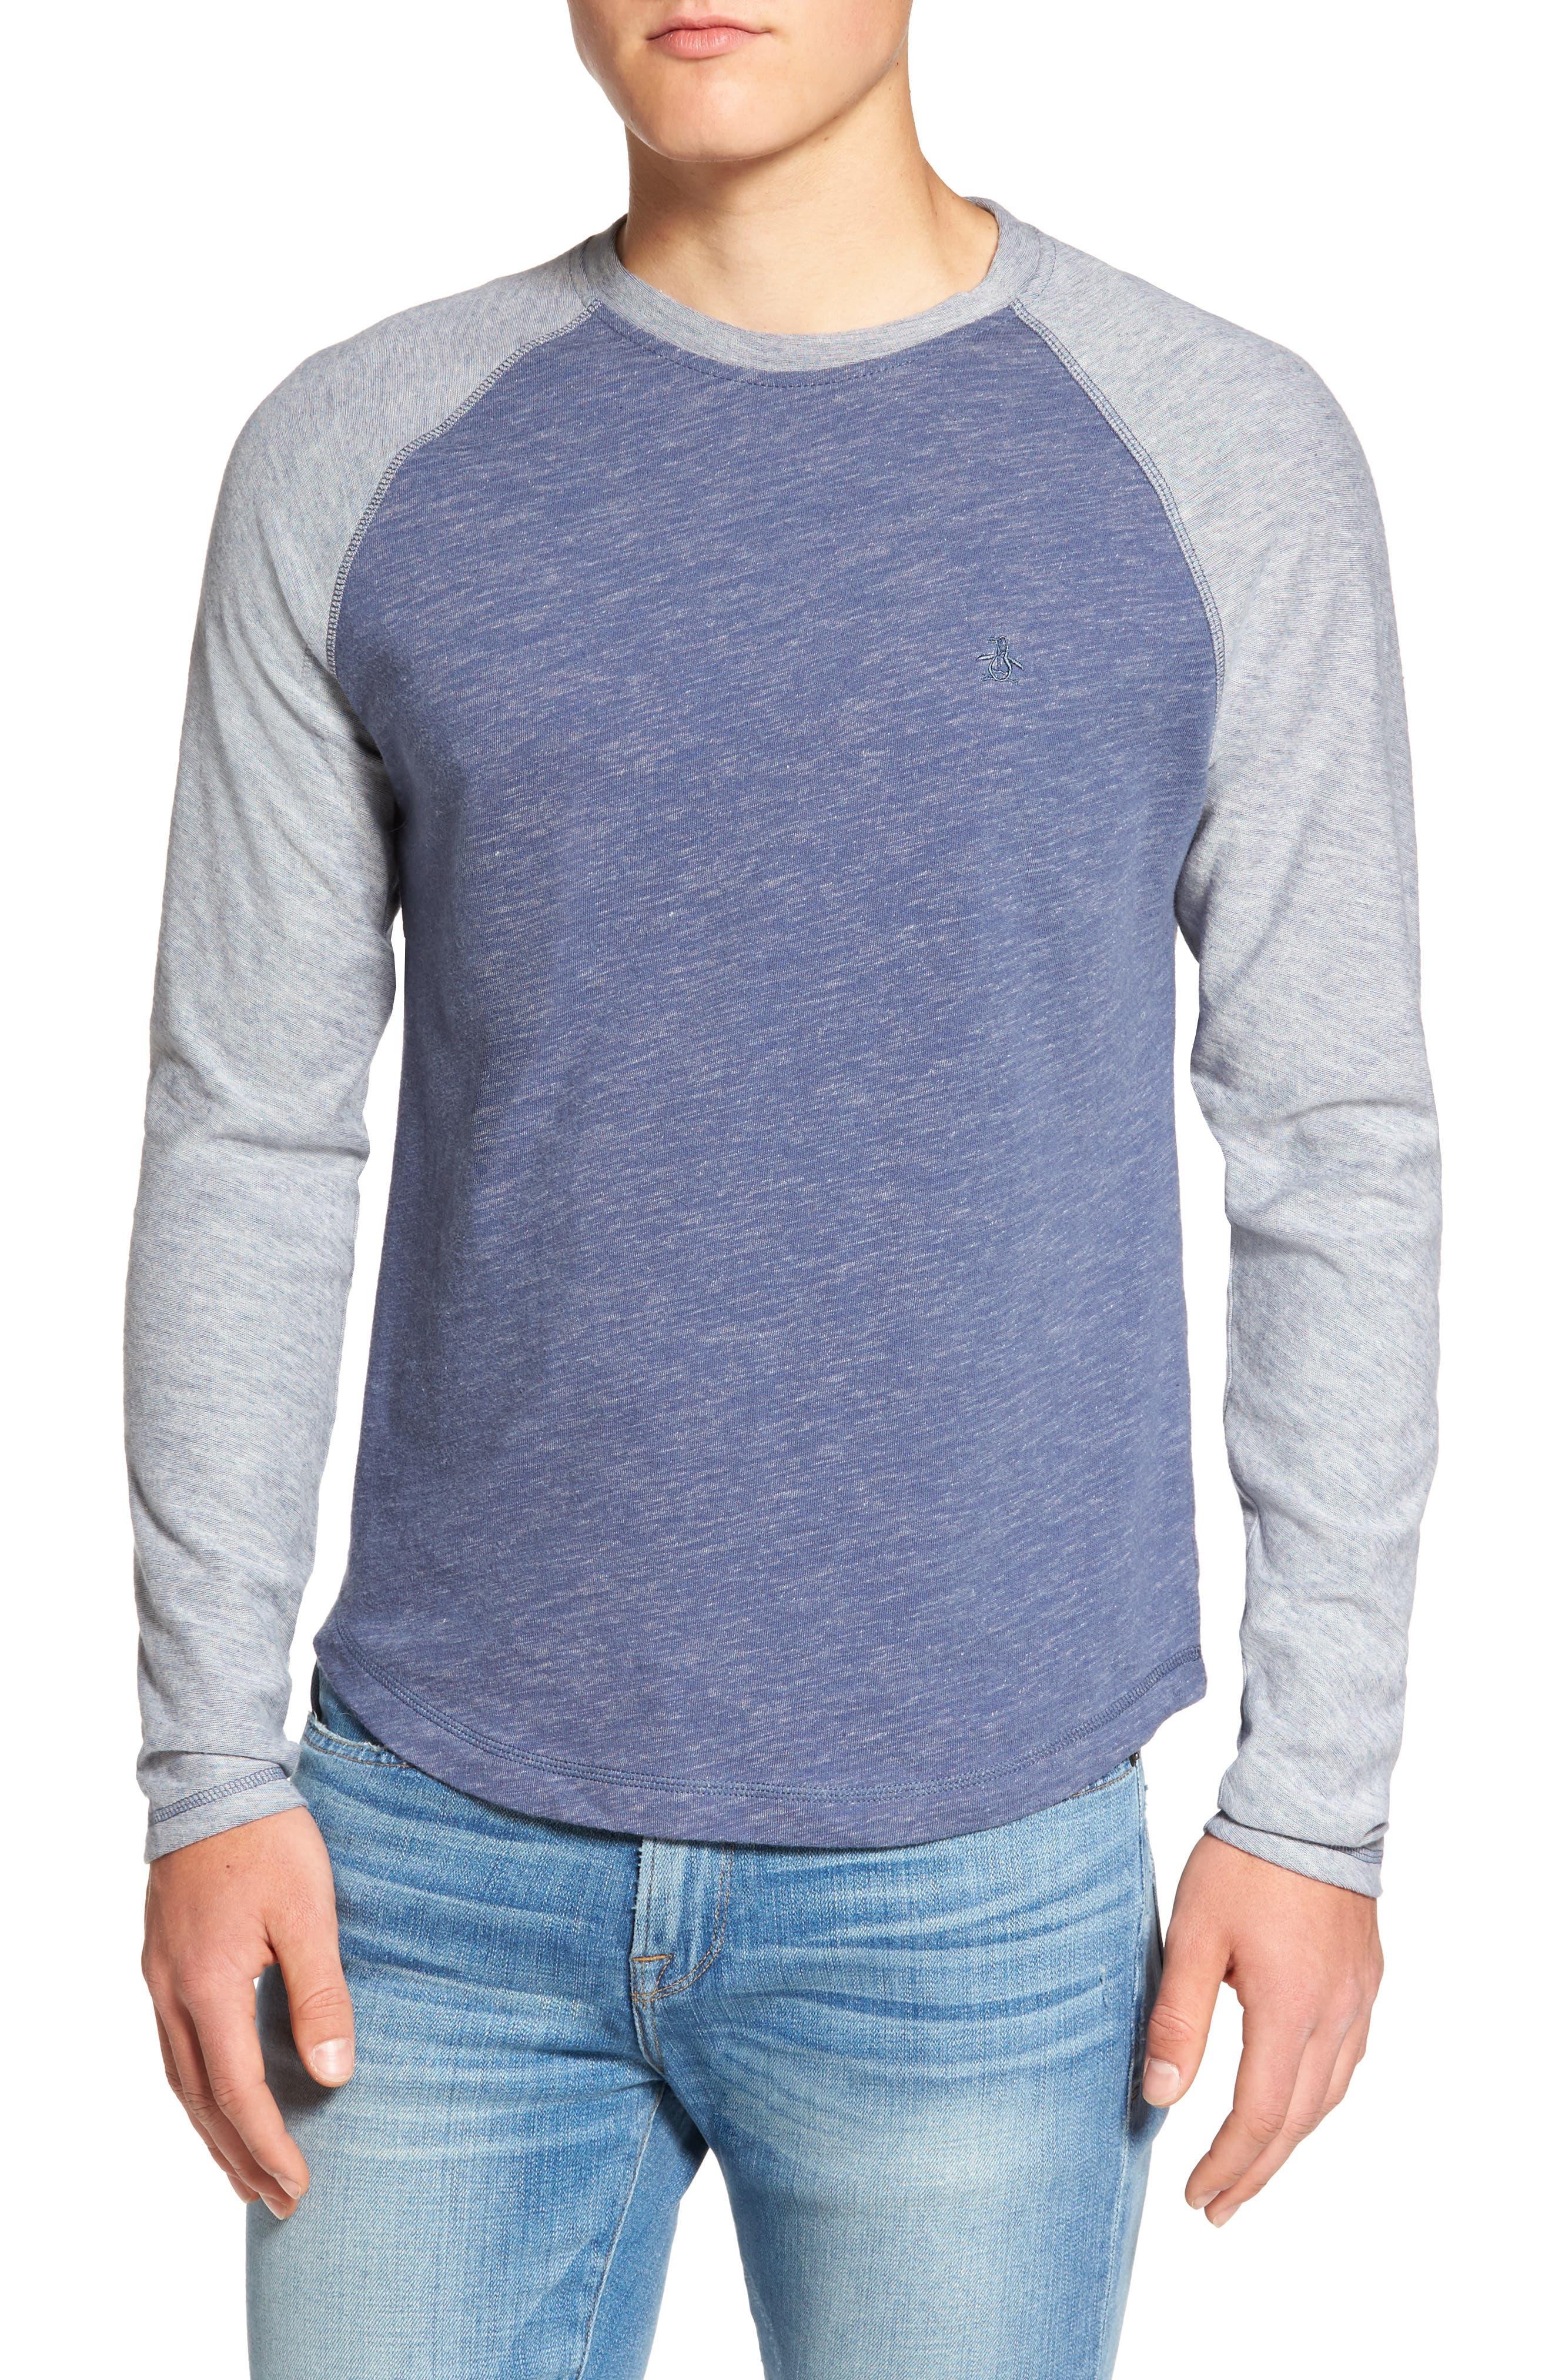 Original Penguin Raglan Long Sleeve T-Shirt